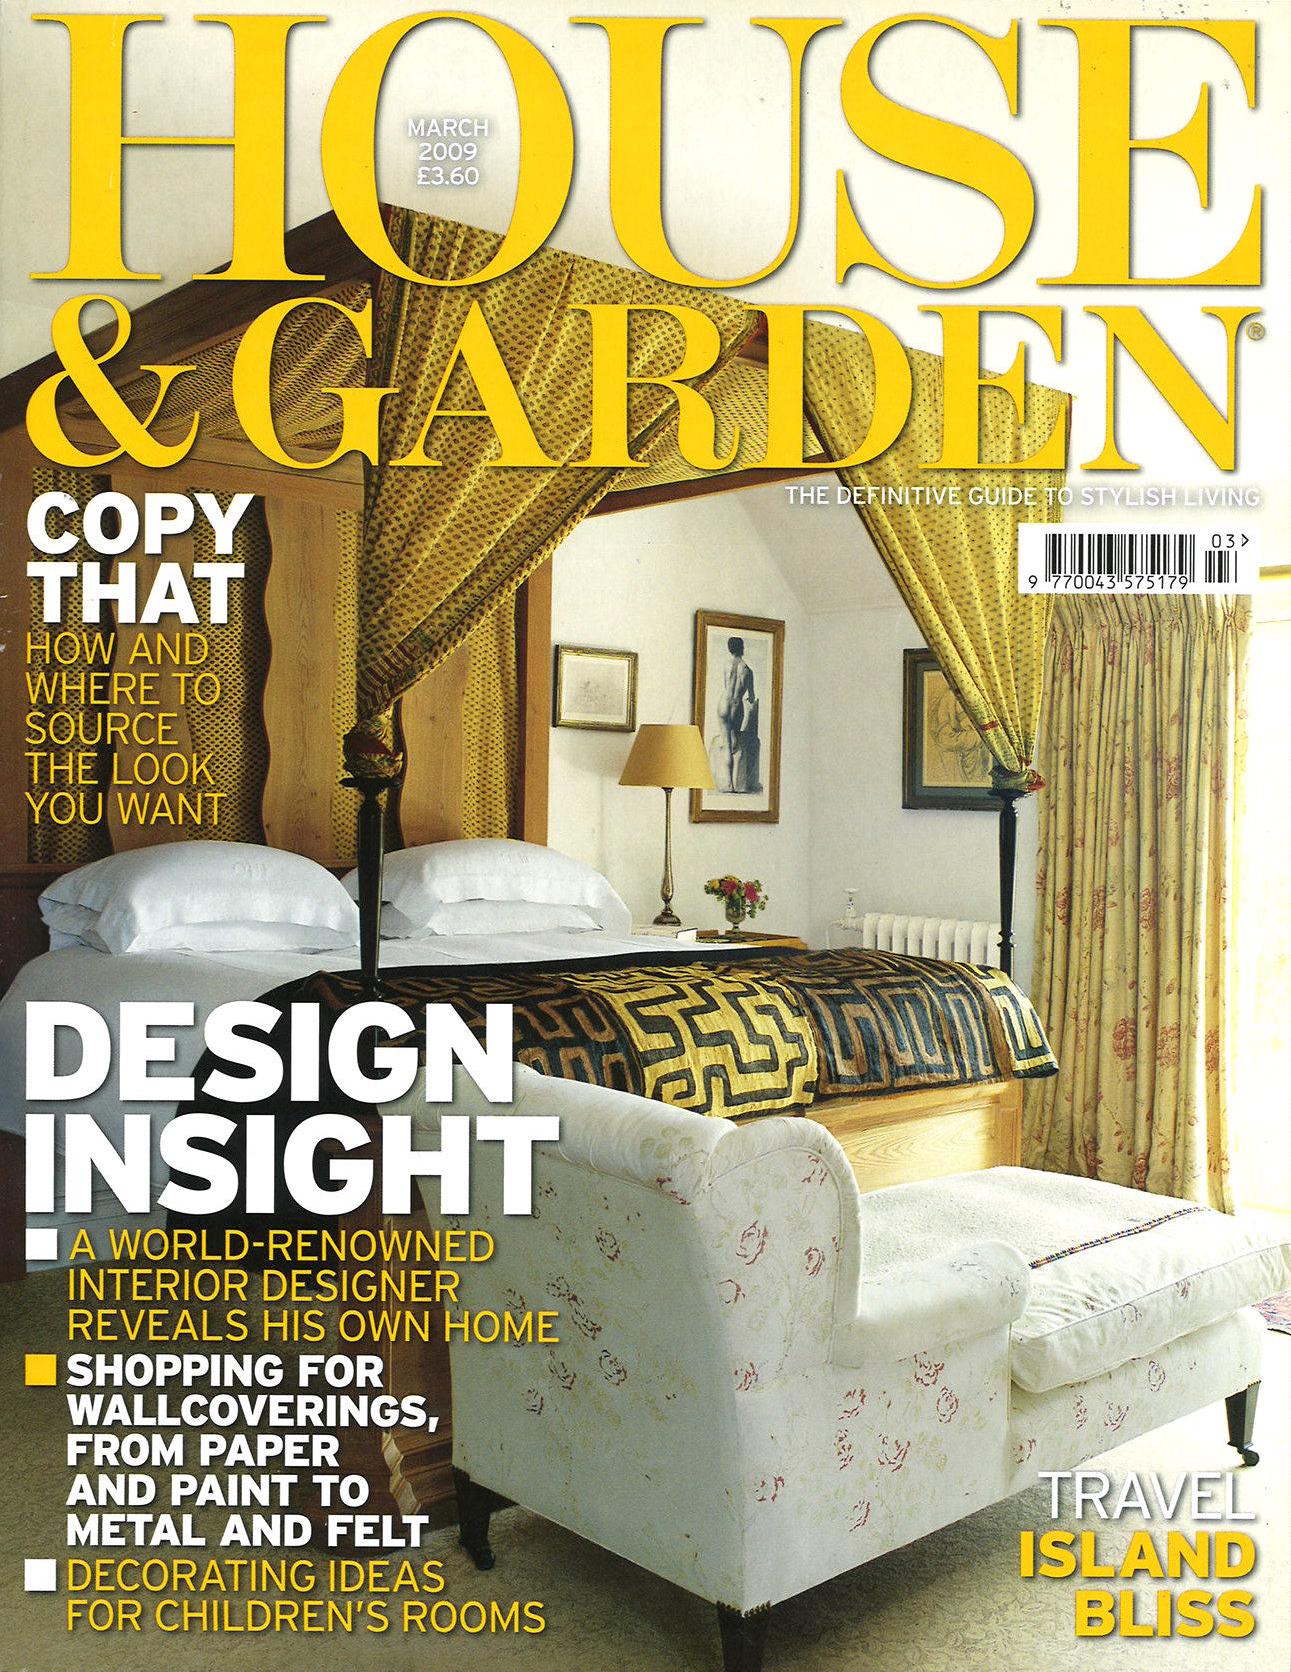 House & Garden - March 2009